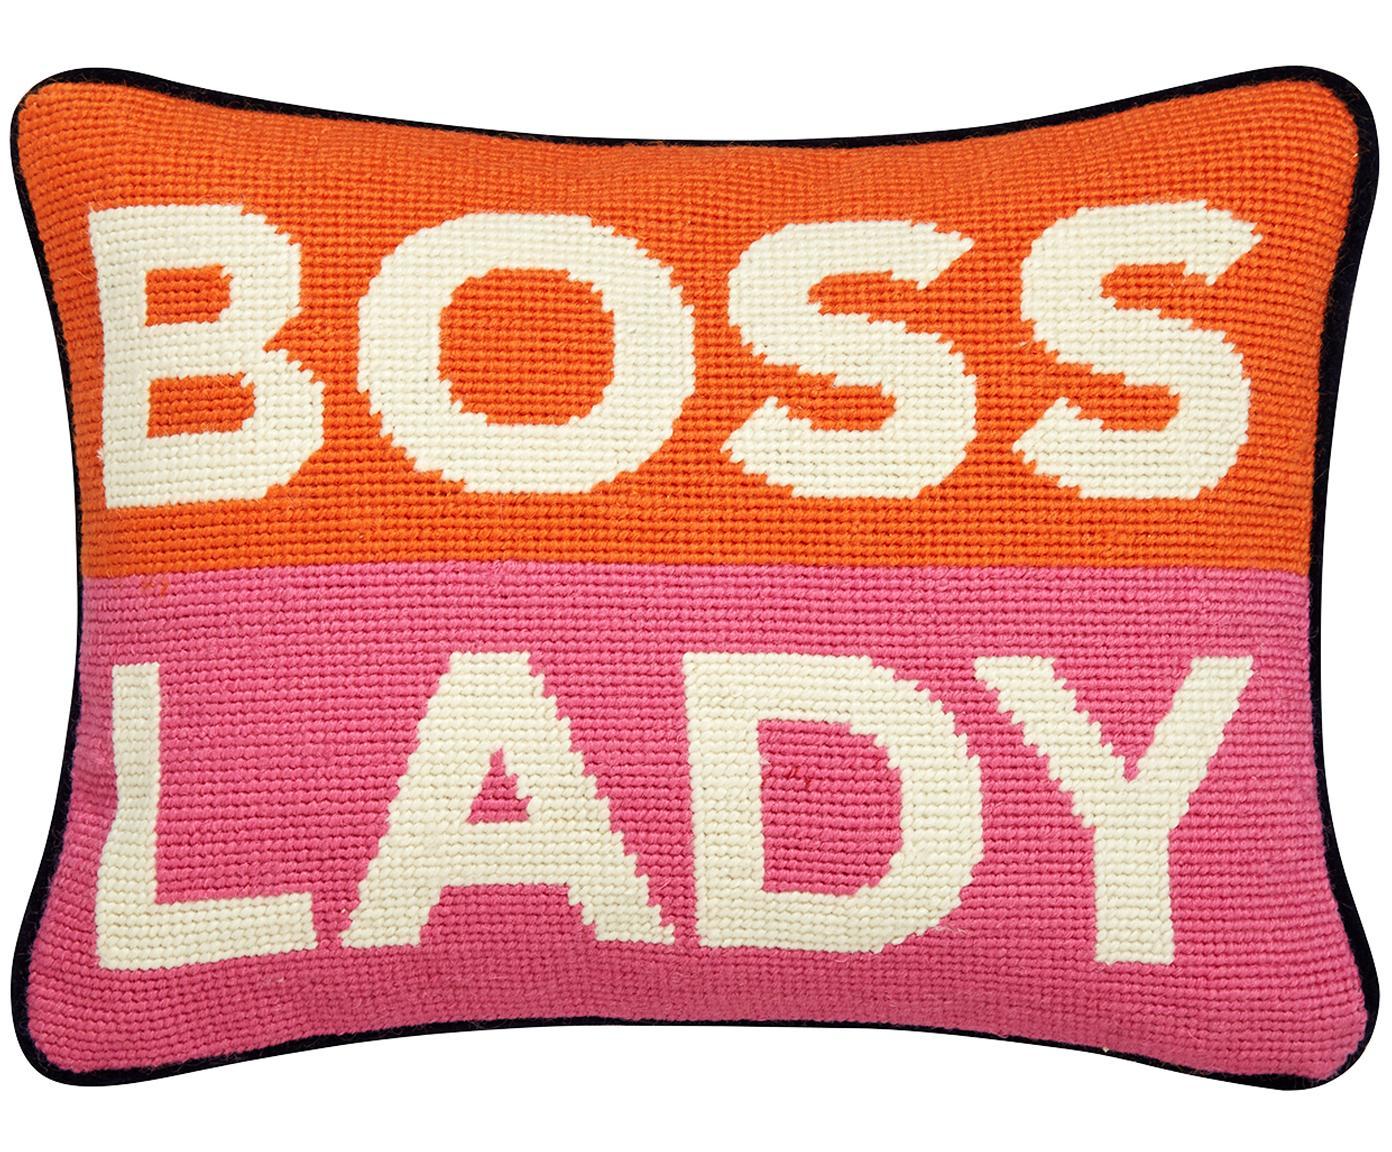 Klein hand geborduurd design kussen Boss Lady, met vulling, Oranje, wit, roze, marineblauw, 23 x 30 cm